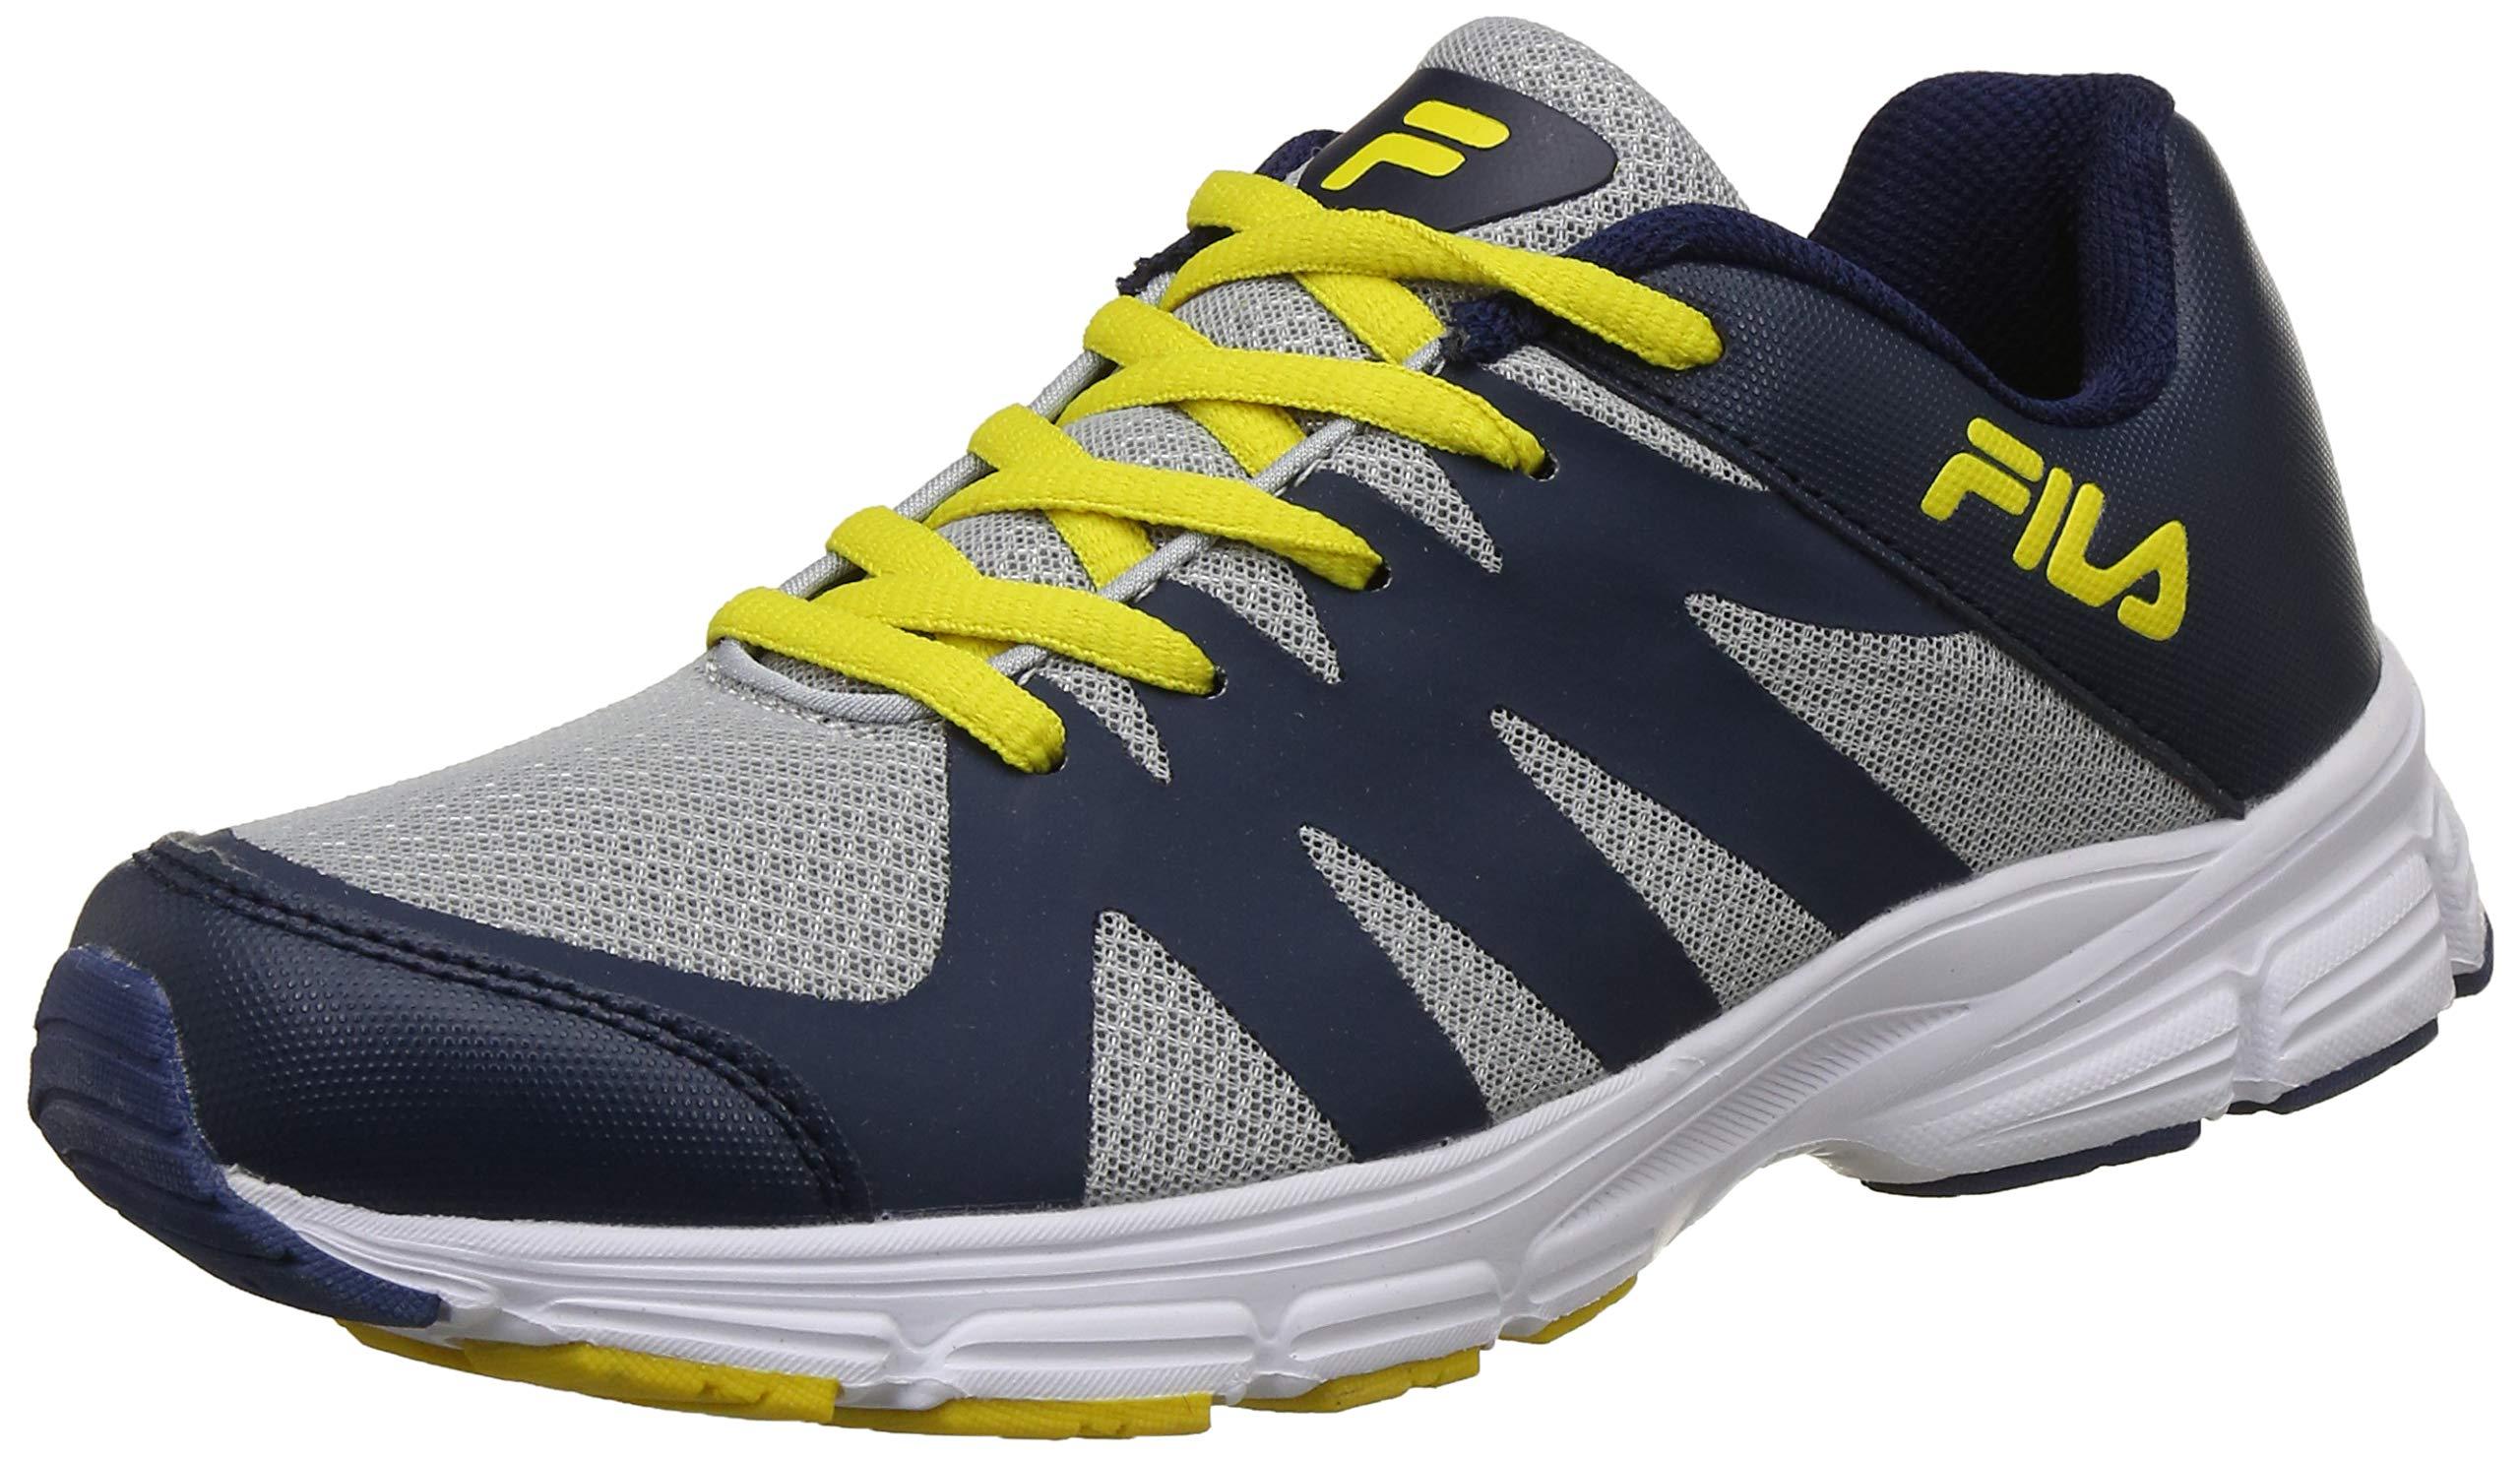 Fila Men's Zigzag Running Shoes- Buy